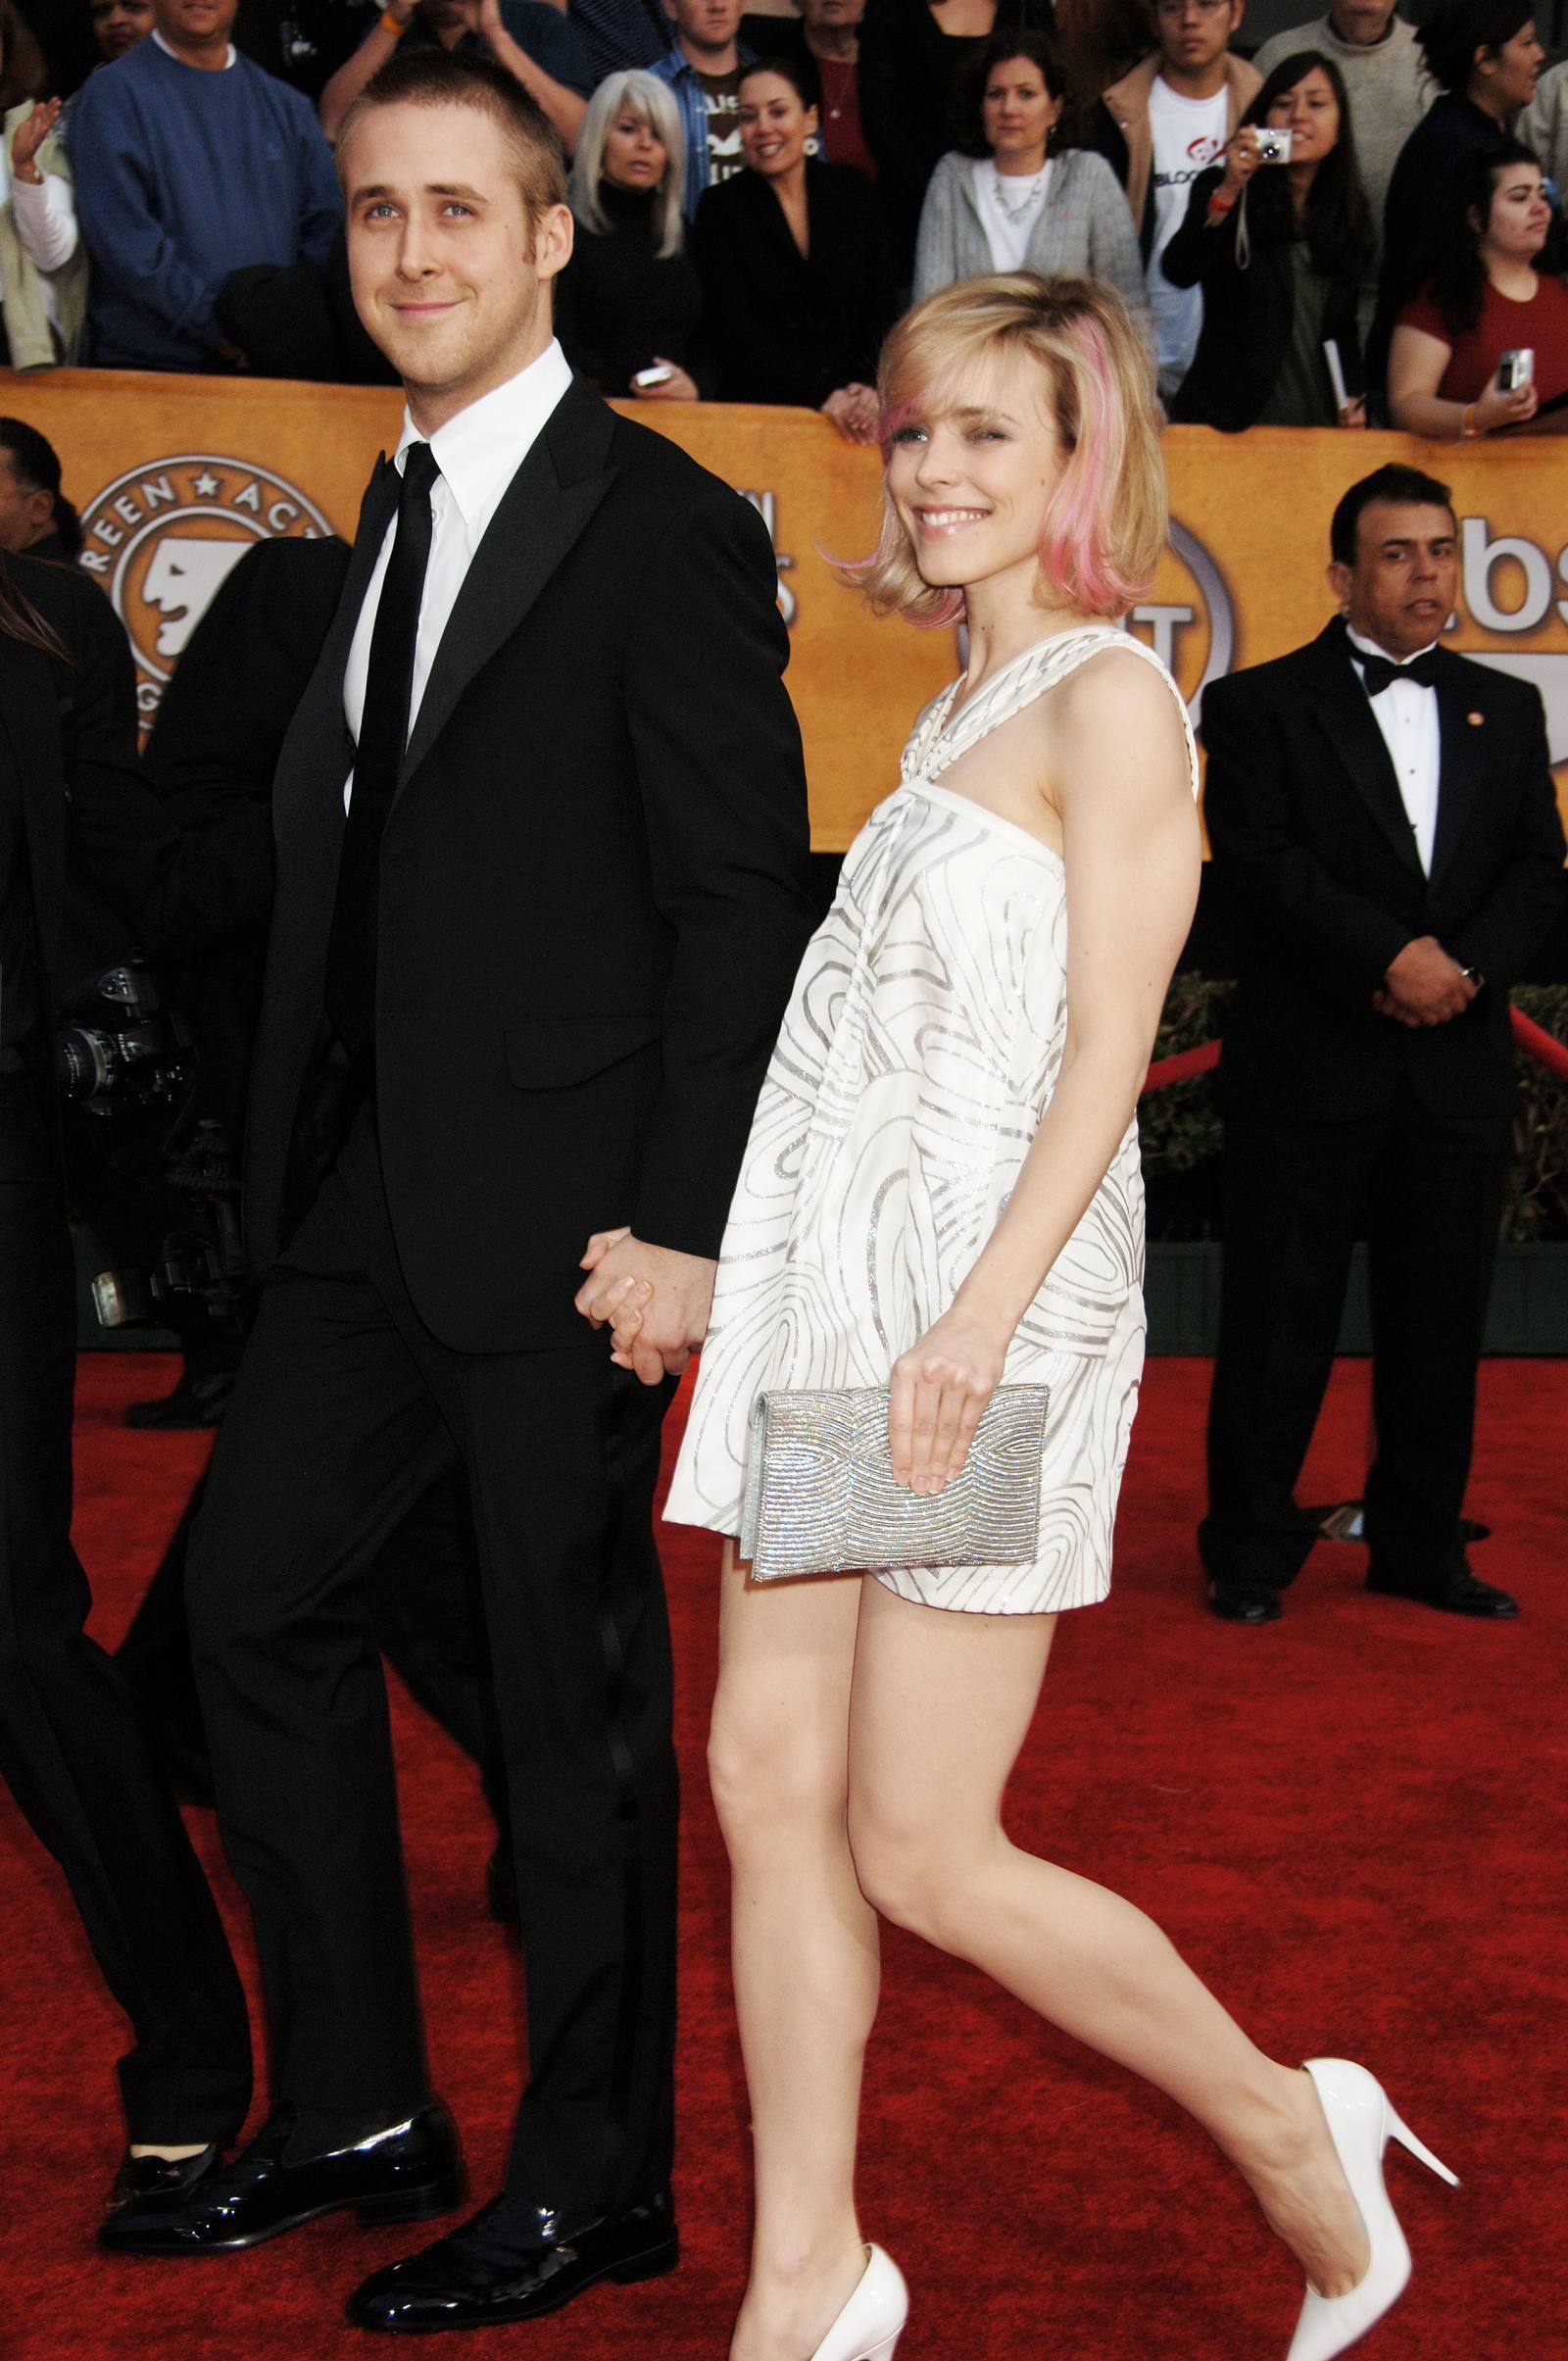 rachel mcadams & ryan gosling - Celebrity Couples Photo